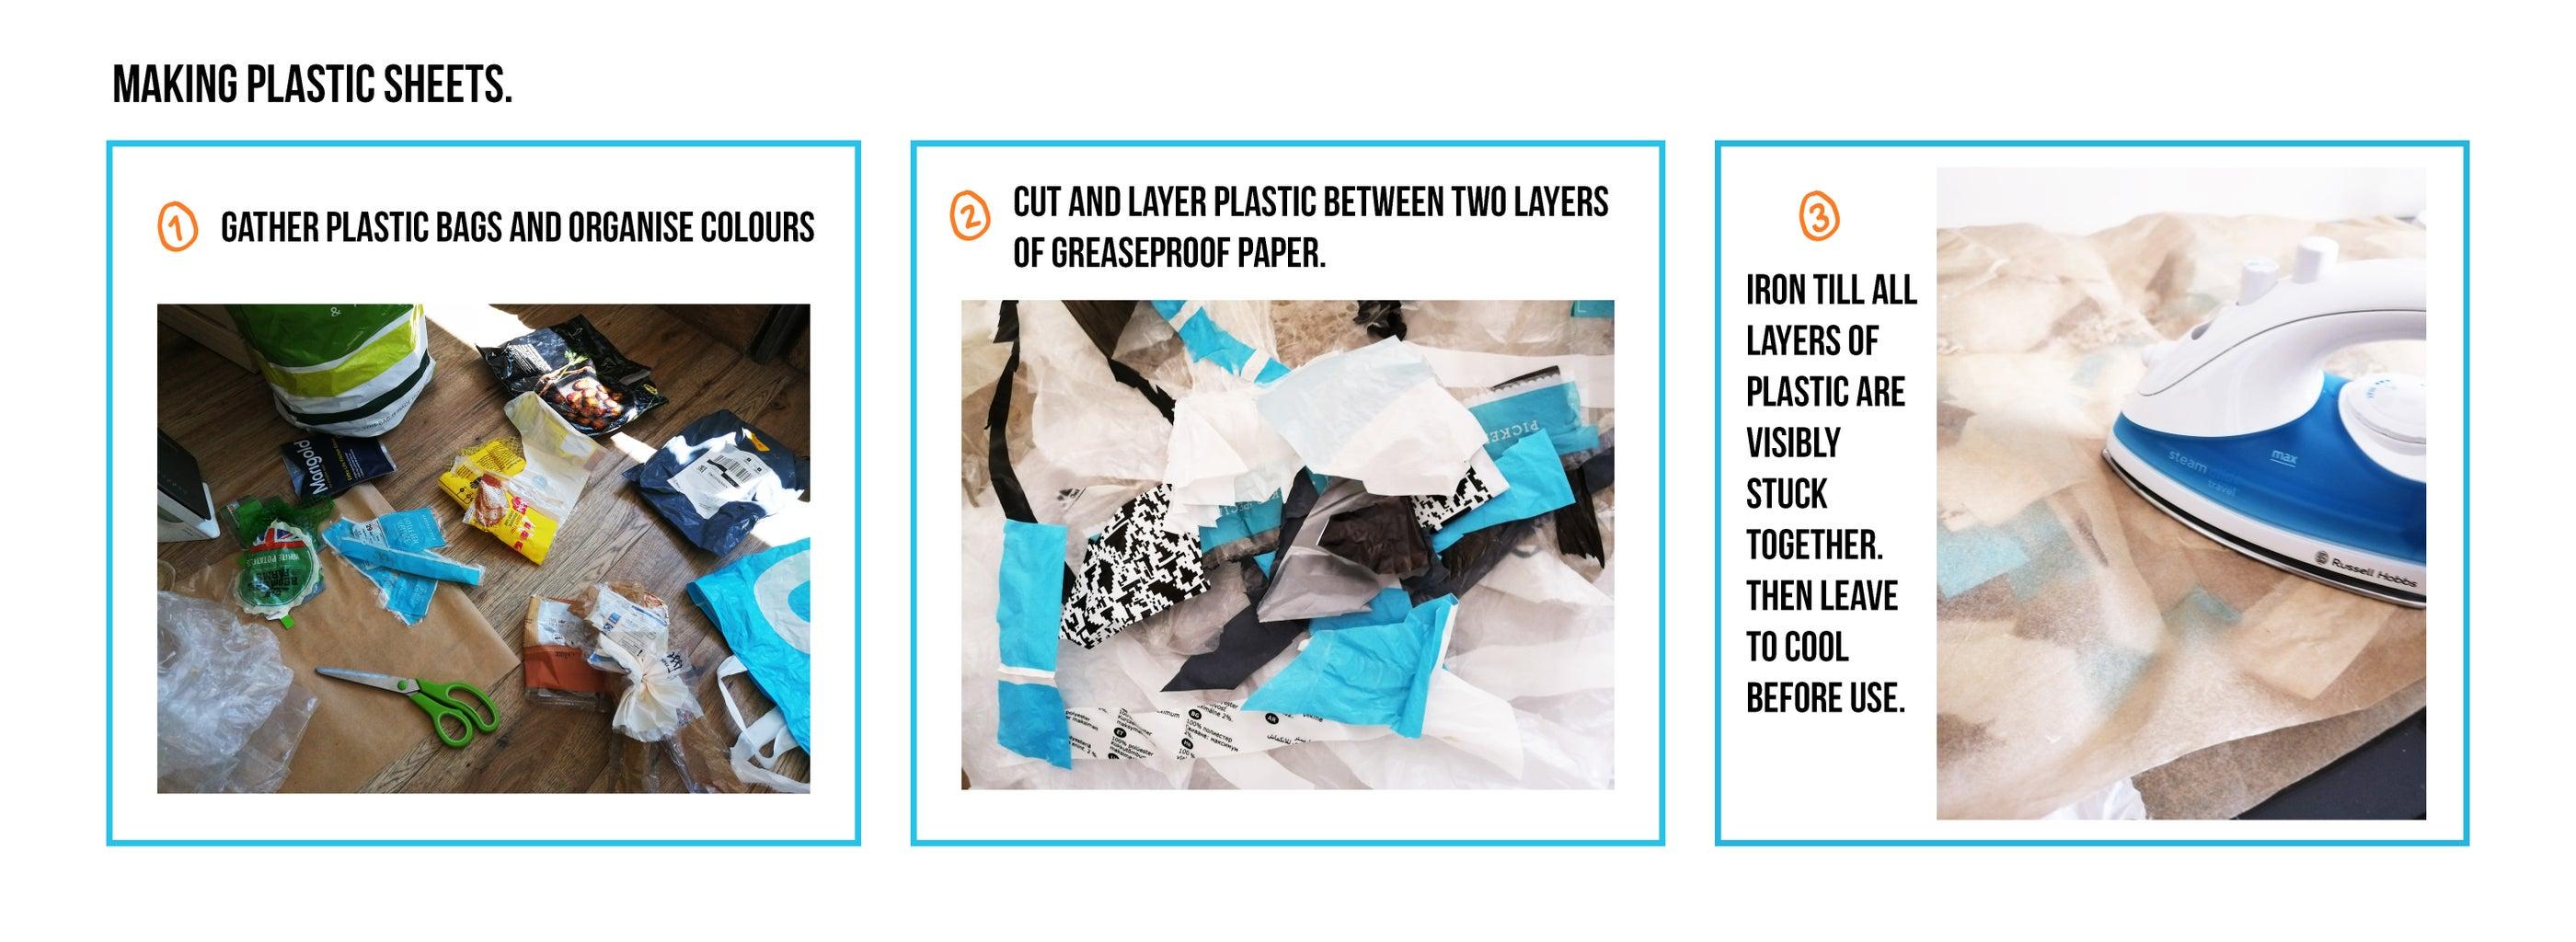 Making Plastic Sheets